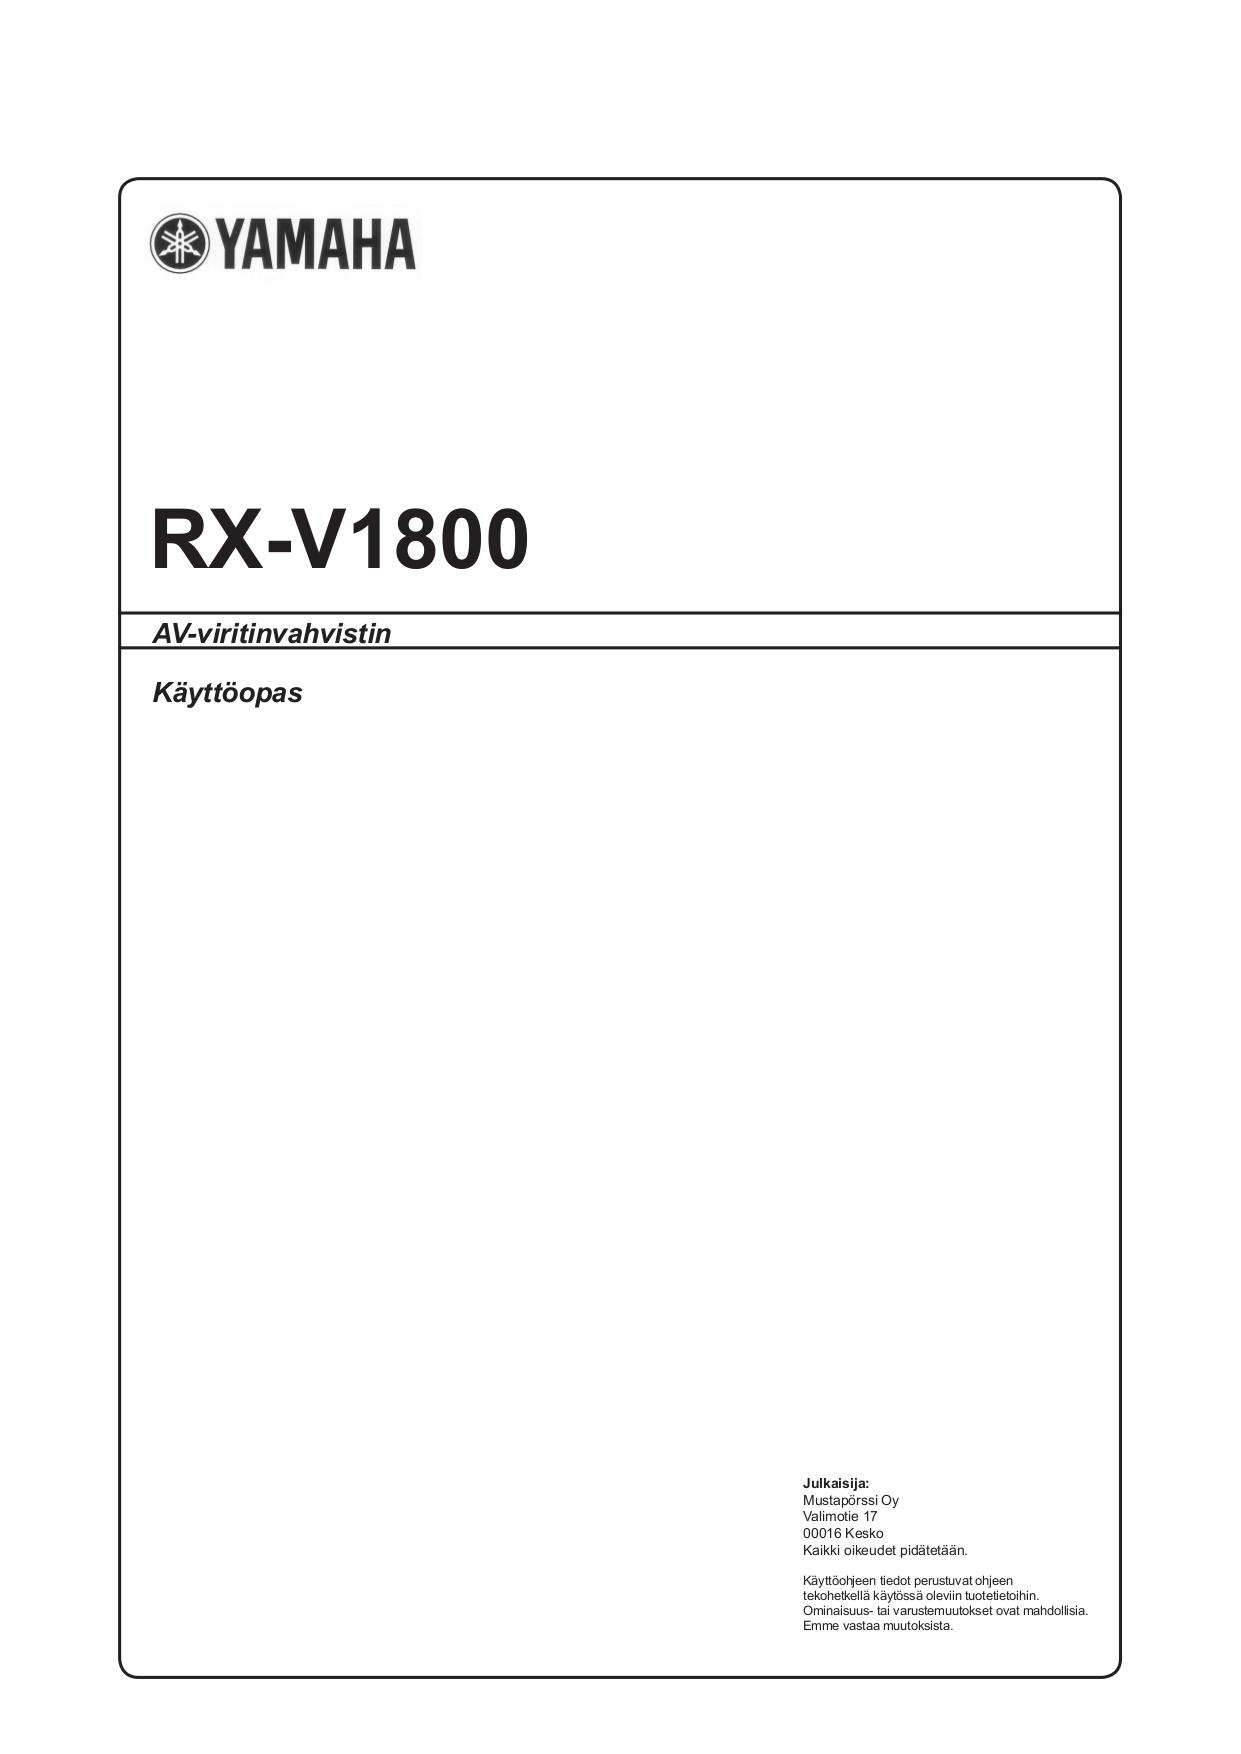 Download free pdf for Yamaha RX-V1800 Receiver manual